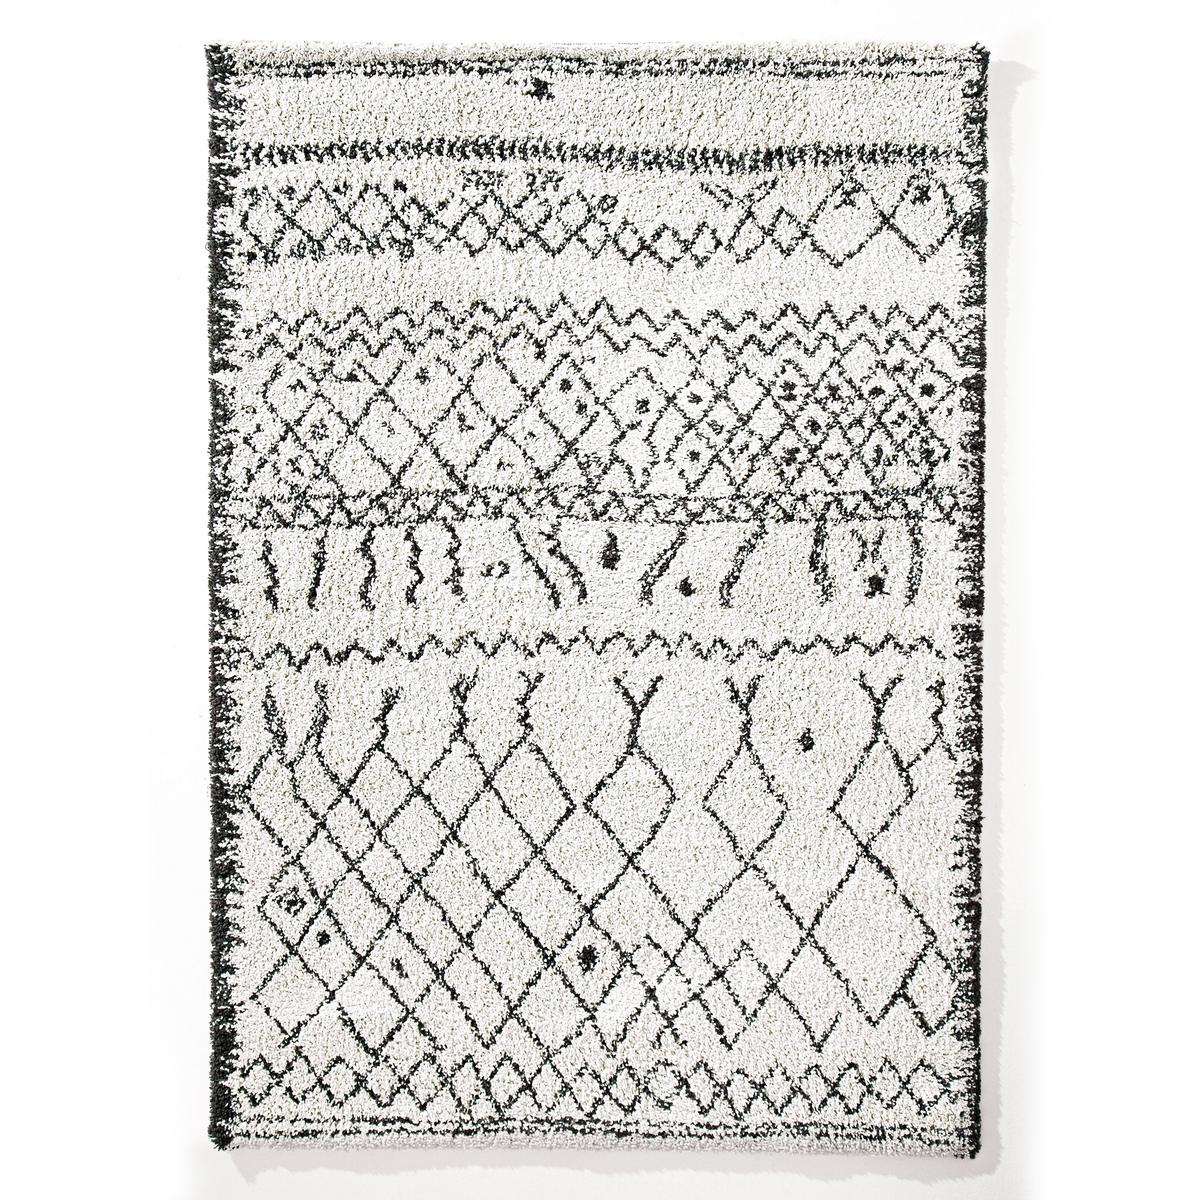 Tappeto stile berbero, Afaw